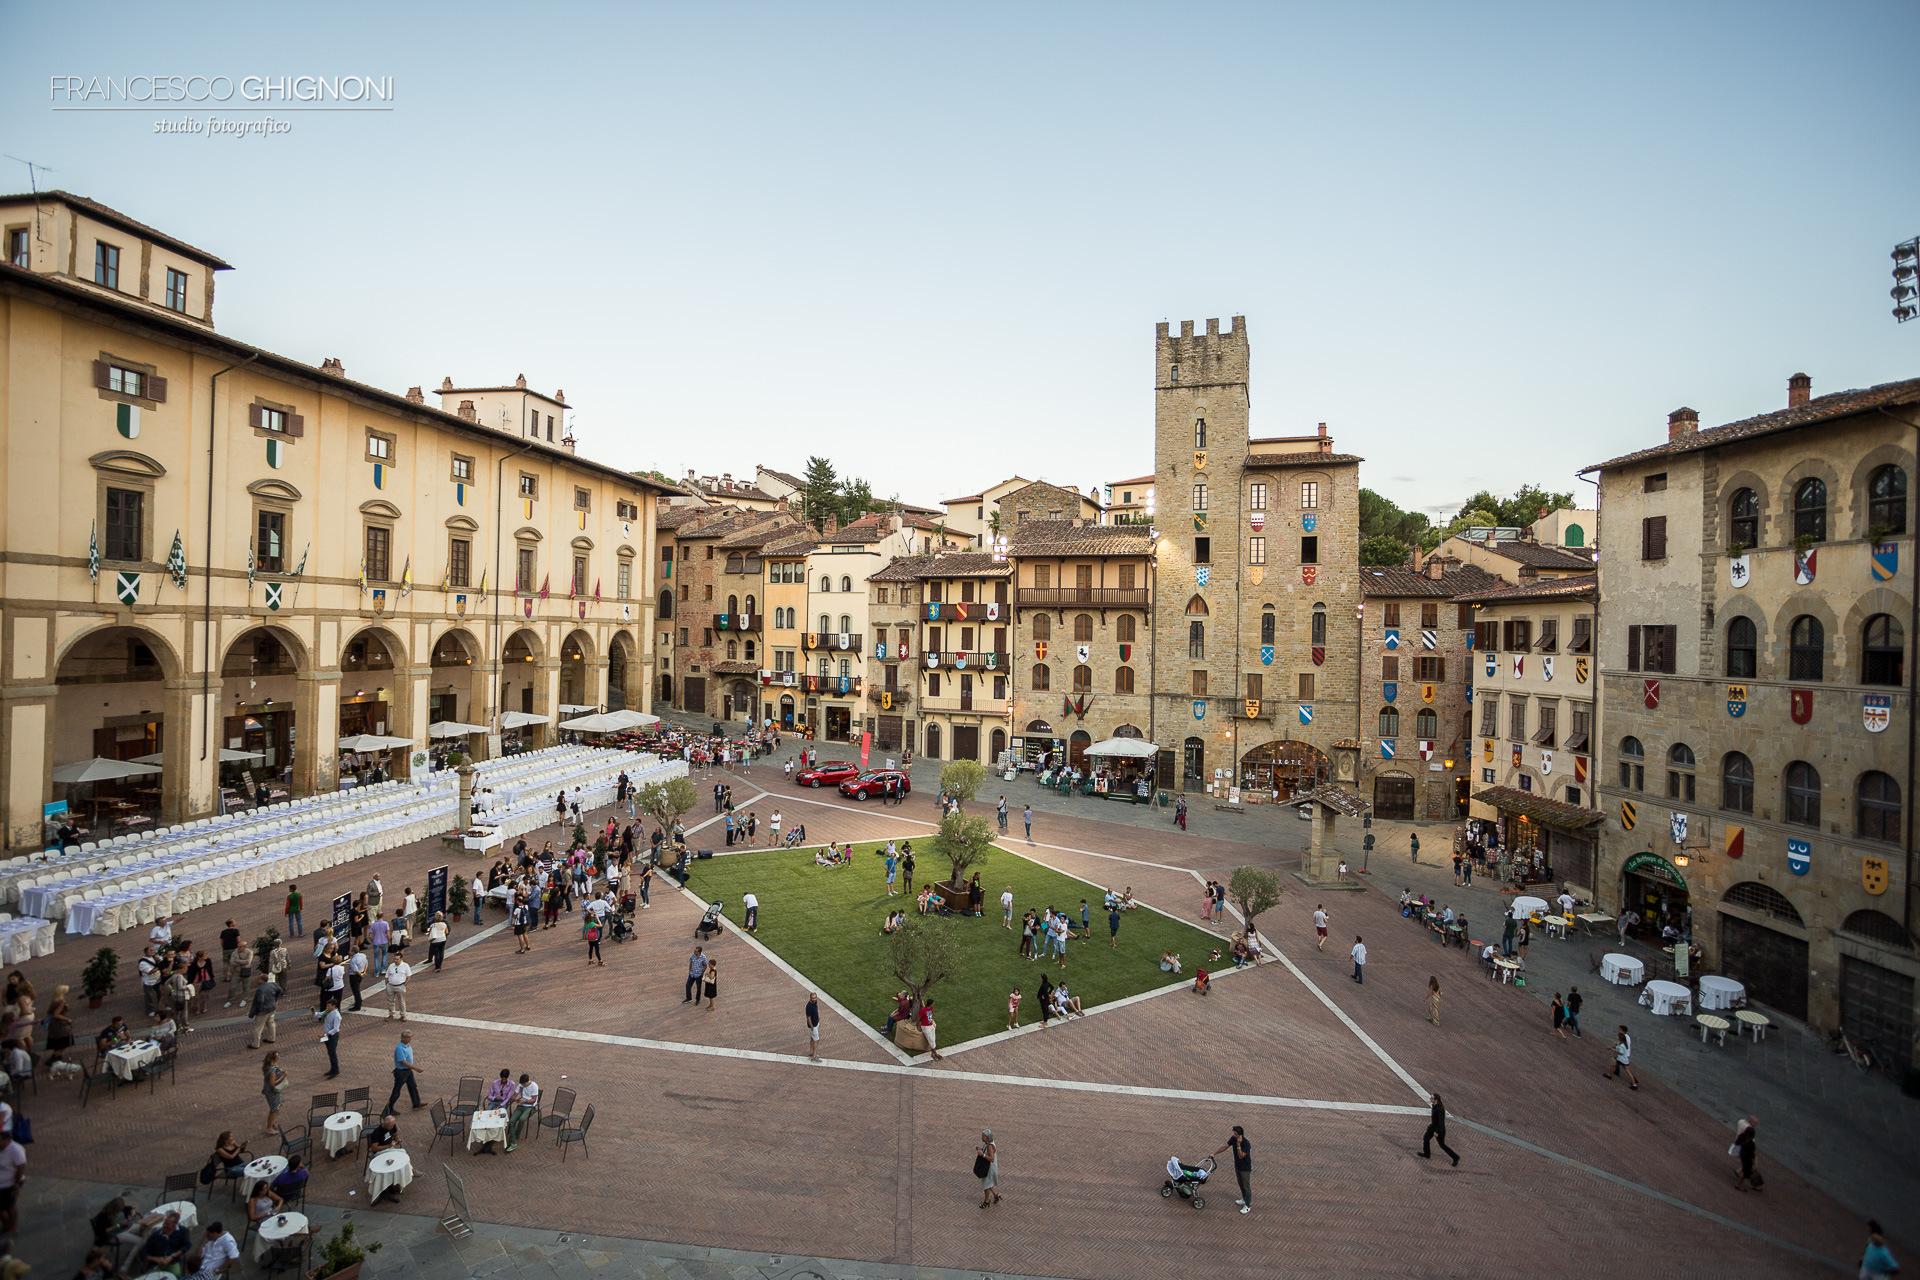 150820195118 - Foto Francesco Ghignoni